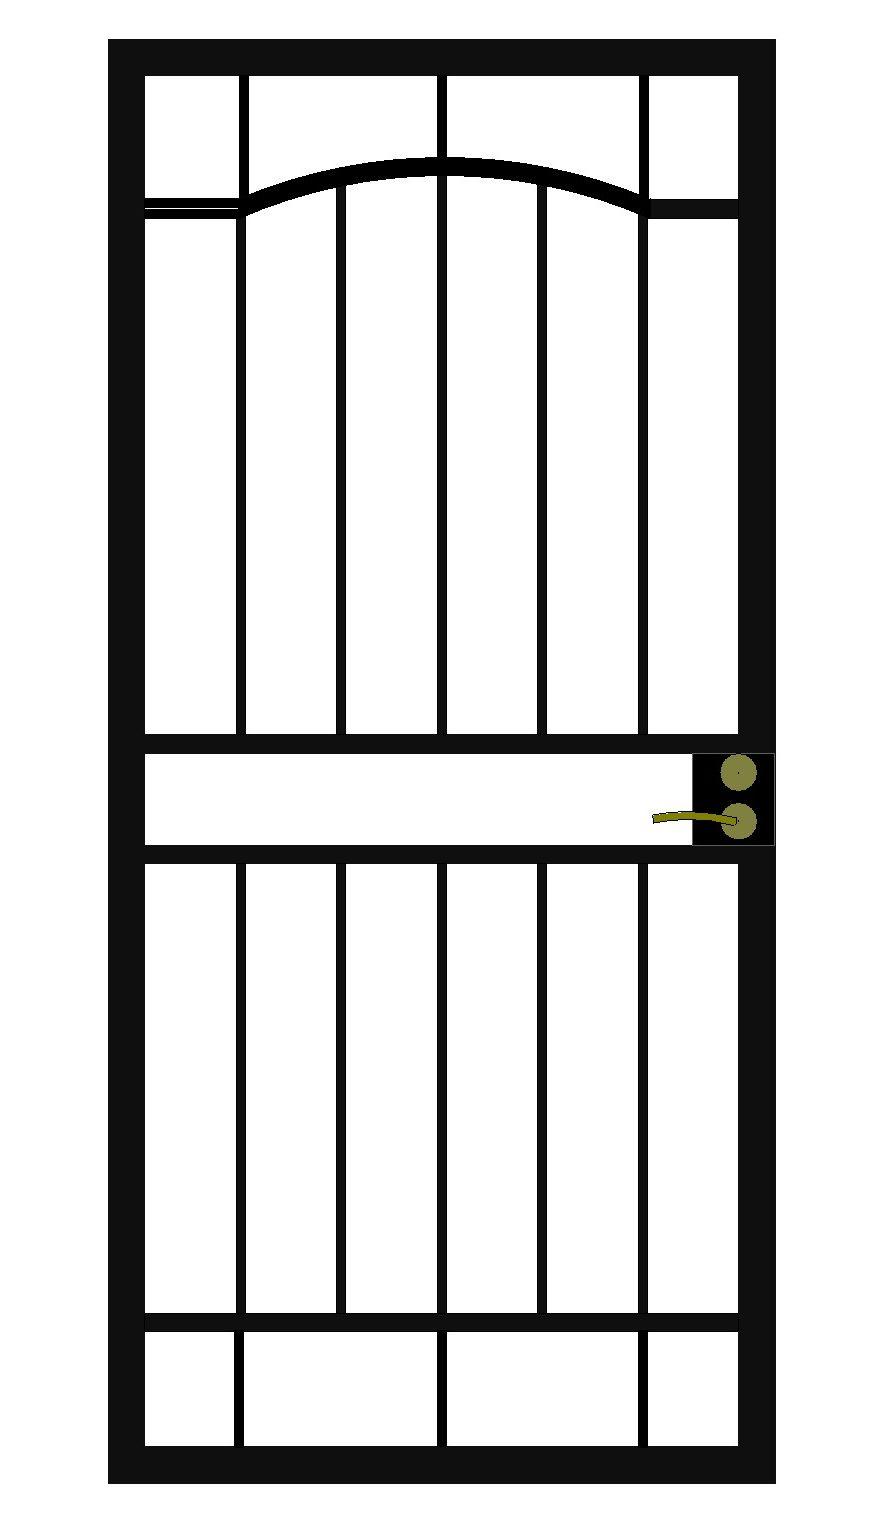 (B) Open View (LB)